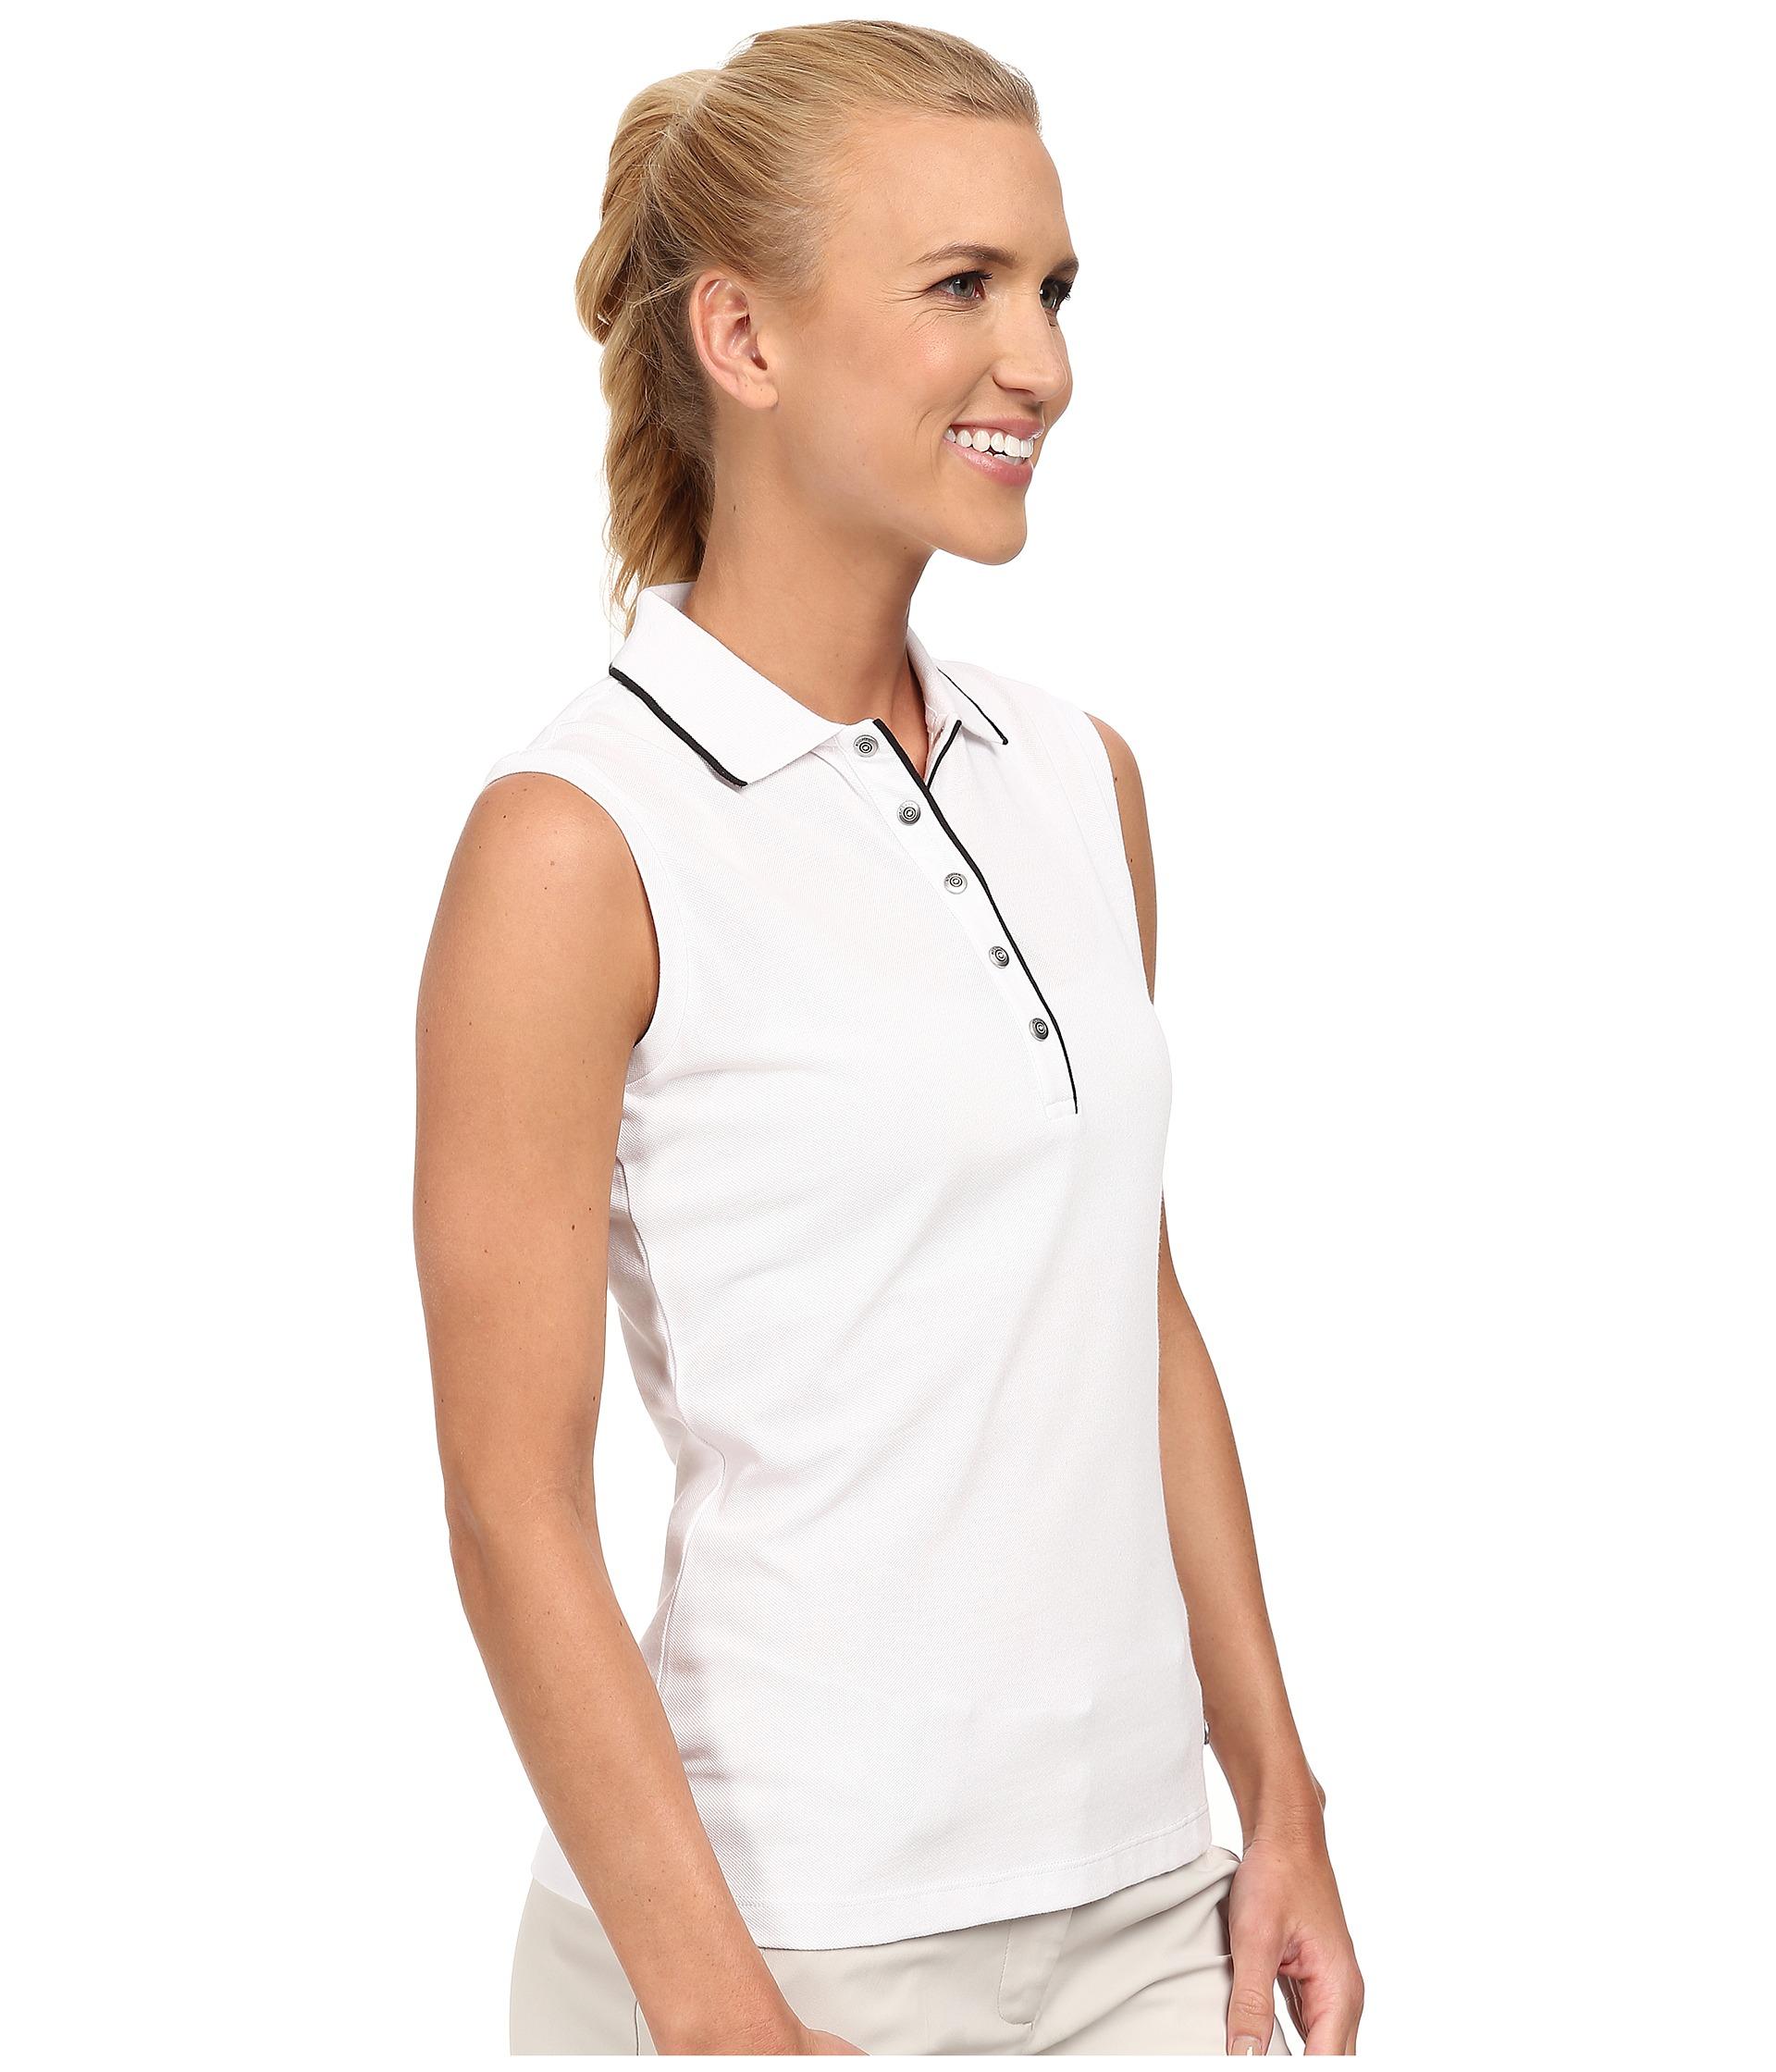 Sleeveless Collared Polo Shirts Bcd Tofu House